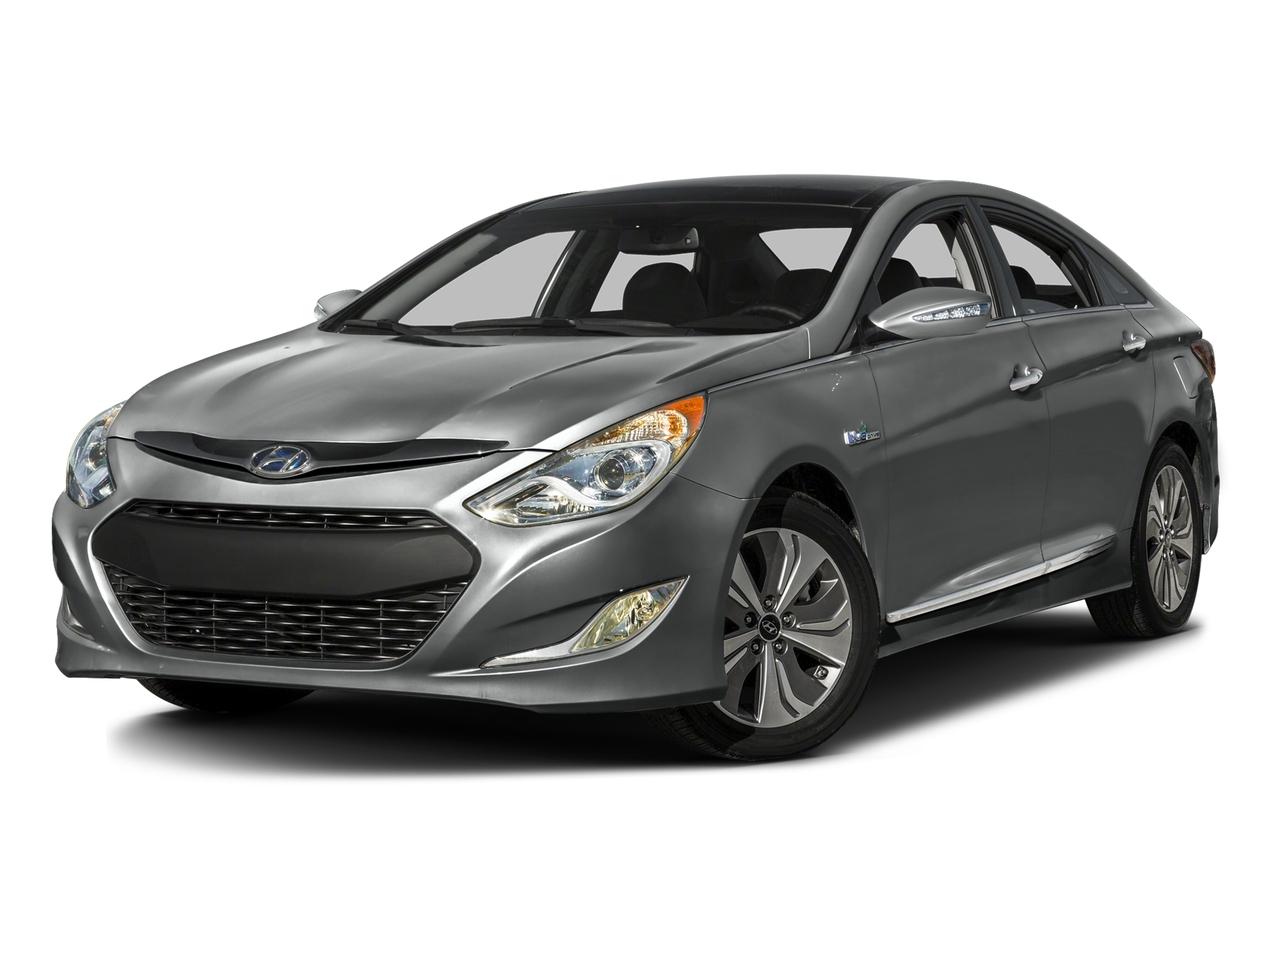 Pewter Gray Metallic 2015 Hyundai Sonata Hybrid 4dr Sdn Limited Jacksonville NC